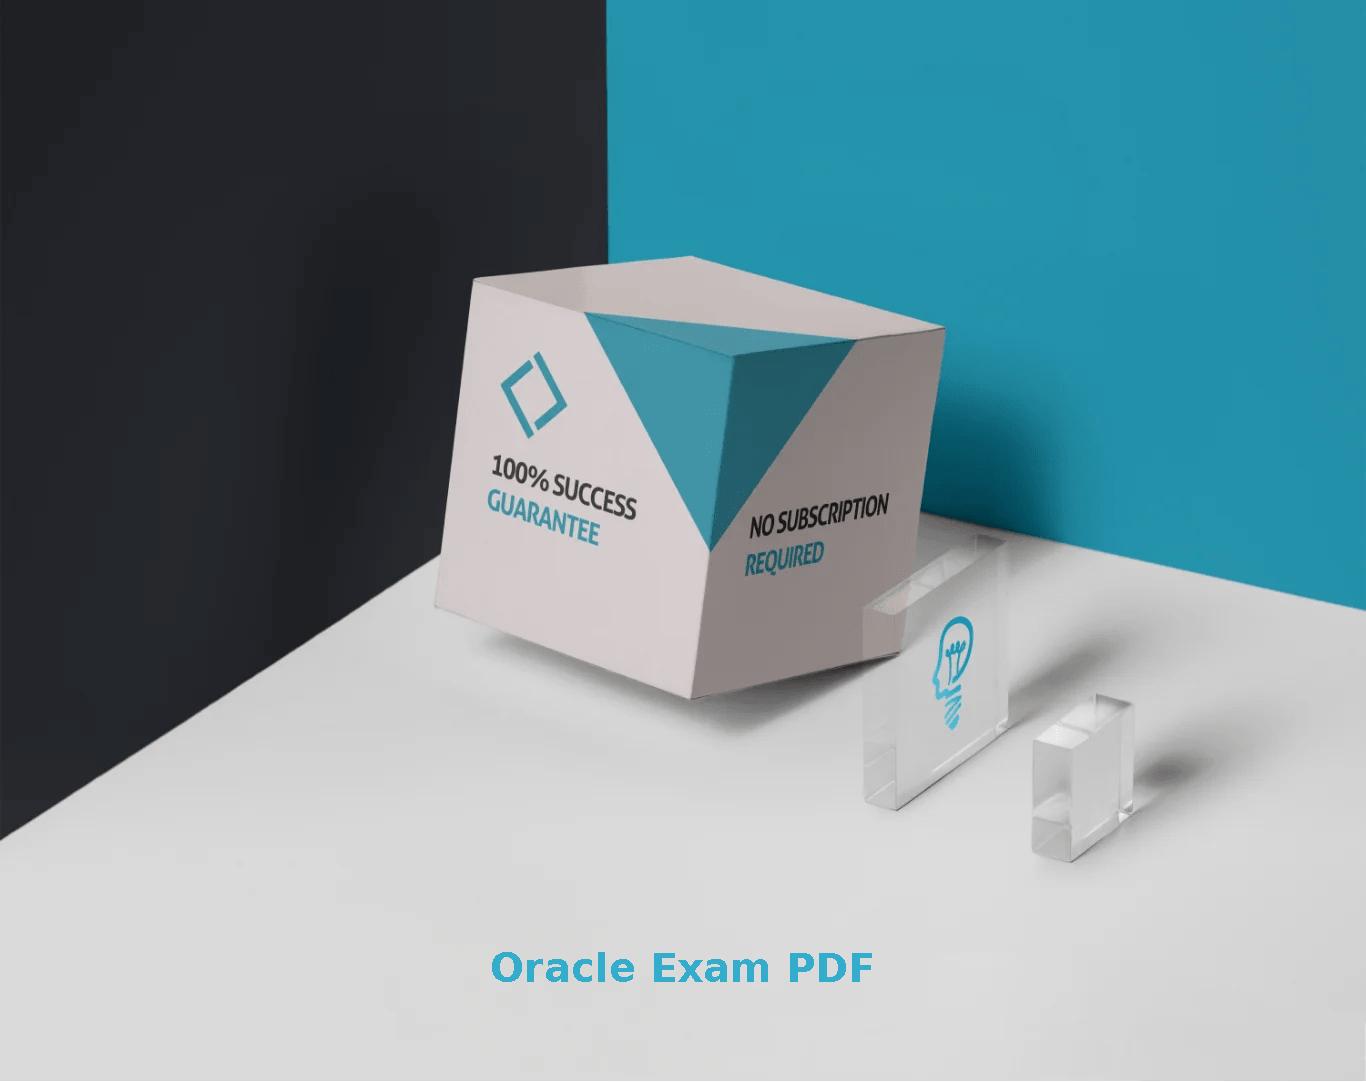 Oracle Exam PDF